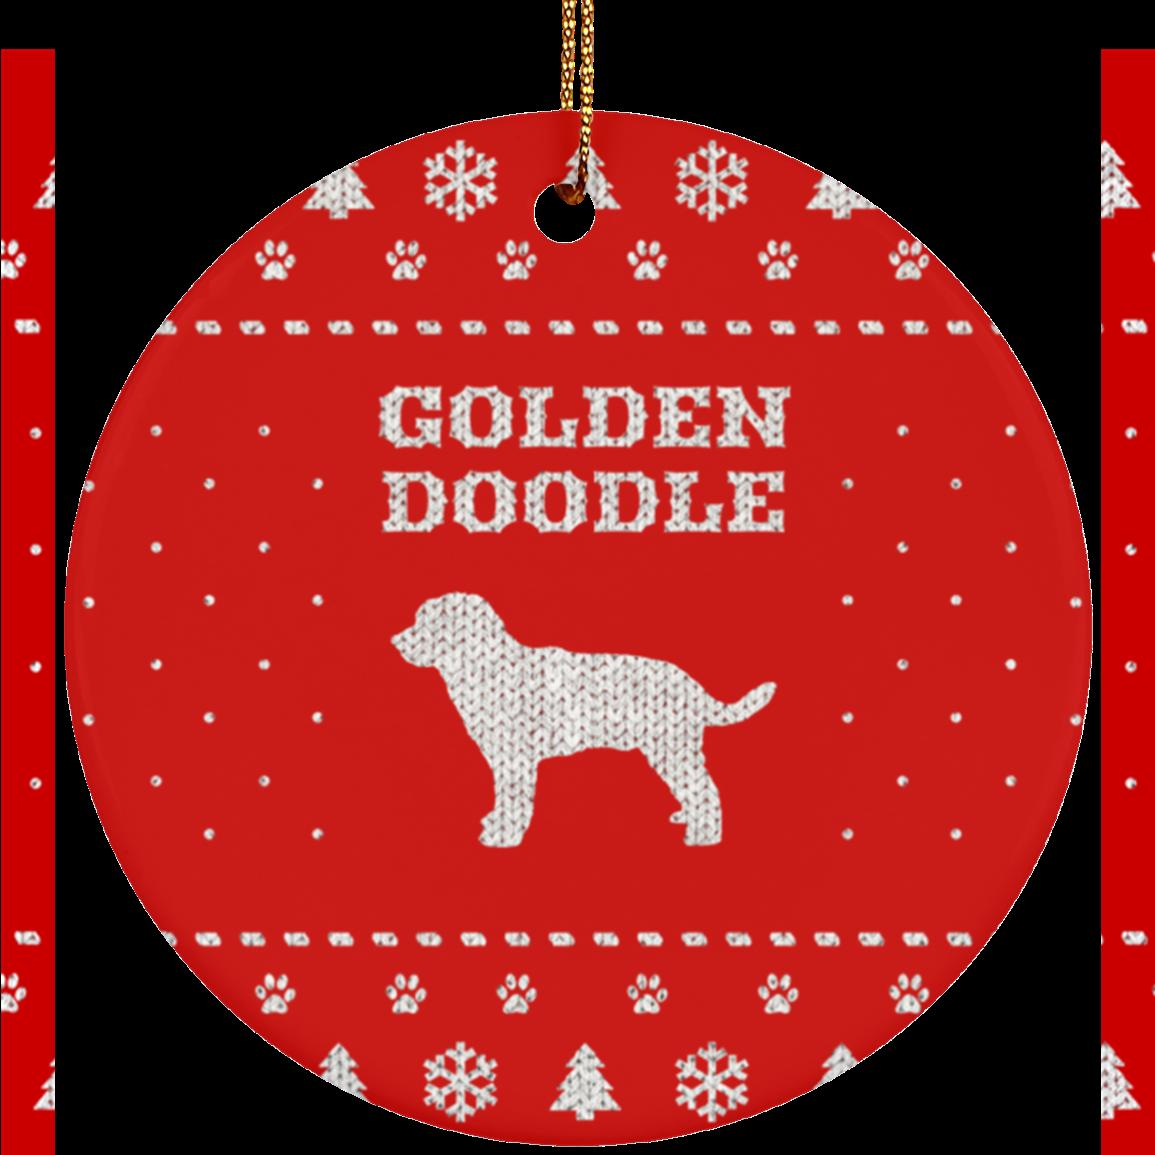 golden doodle holiday ceramic circle ornament iheartdogscom - Goldendoodle Christmas Ornament